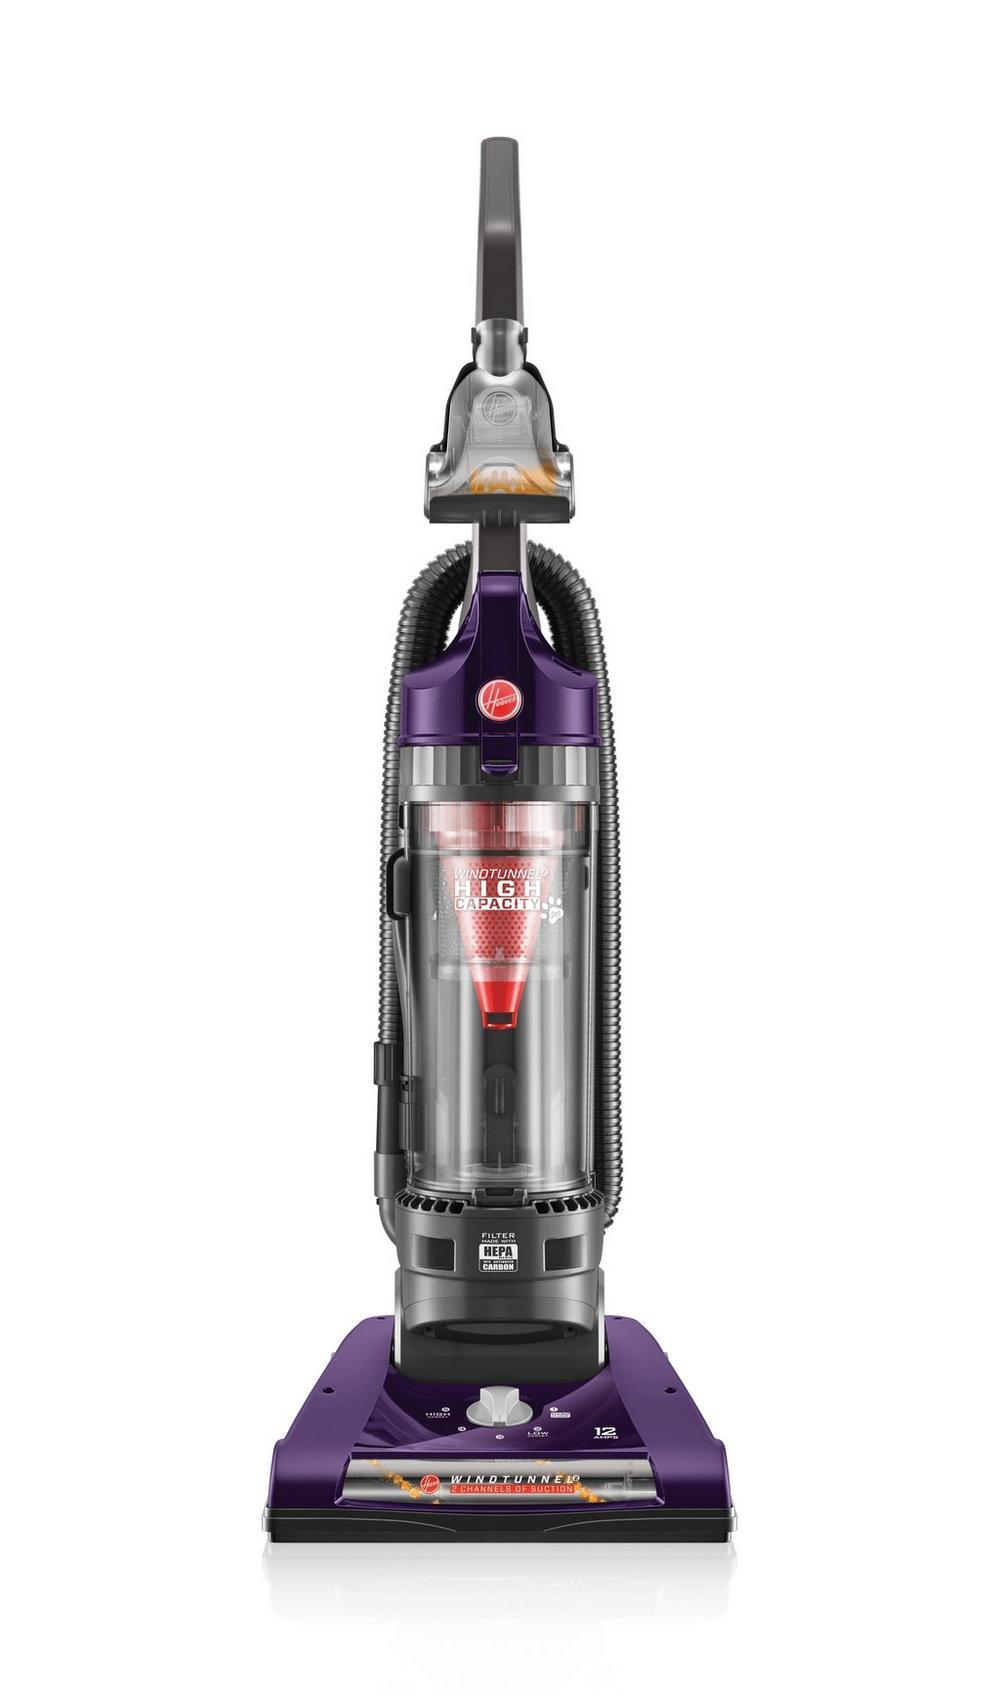 WindTunnel 2 High Capacity Pet Upright Vacuum